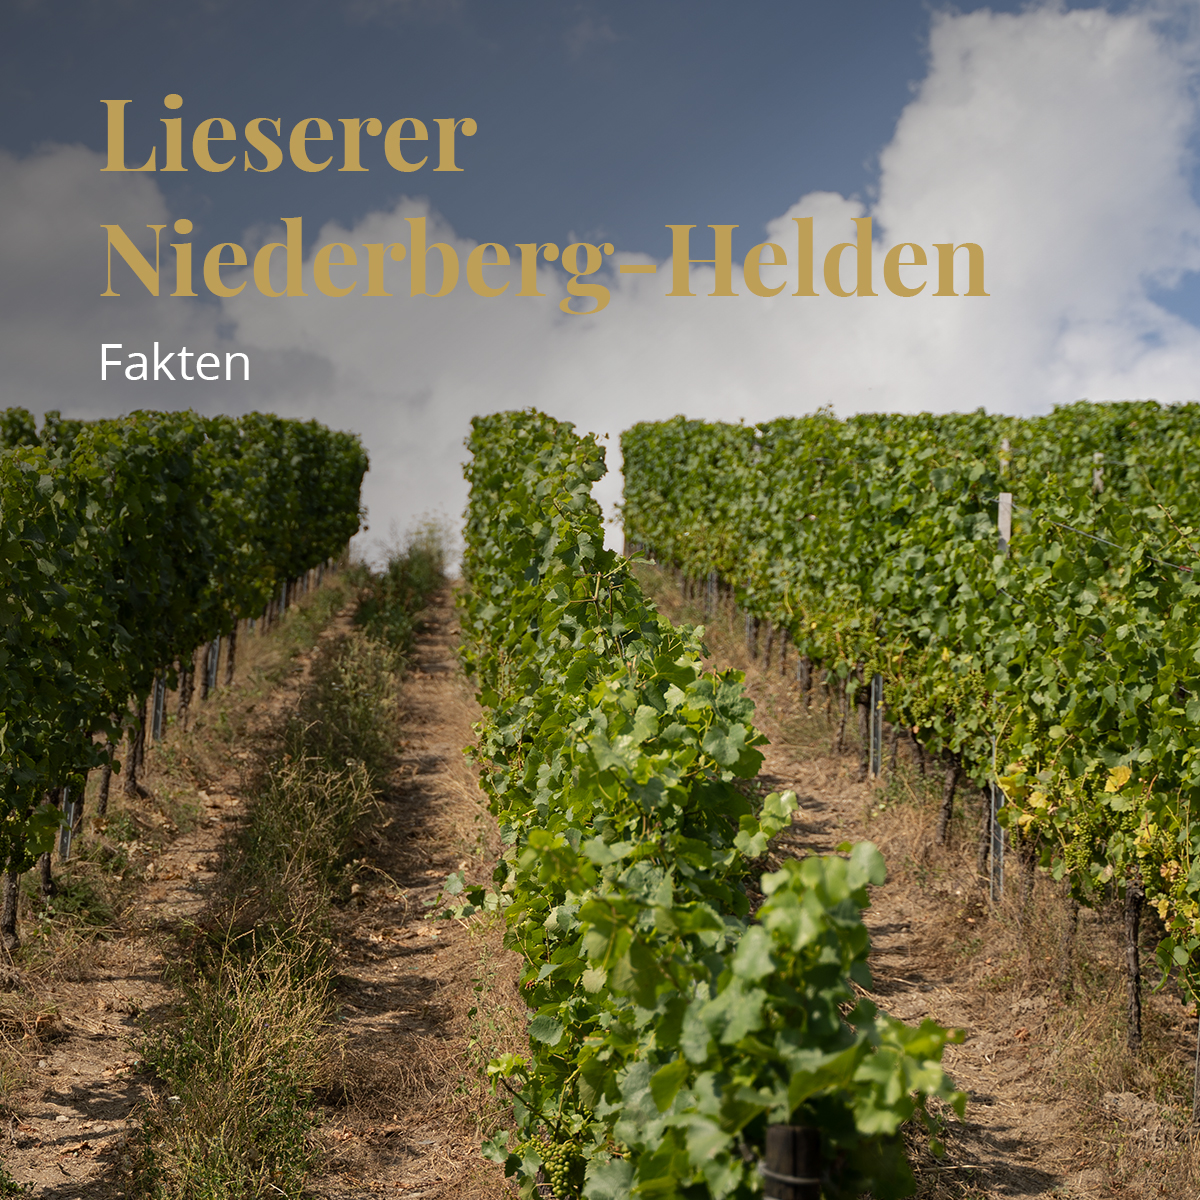 Hubert Botzet - Bioweingut Hubertushof in Lieser